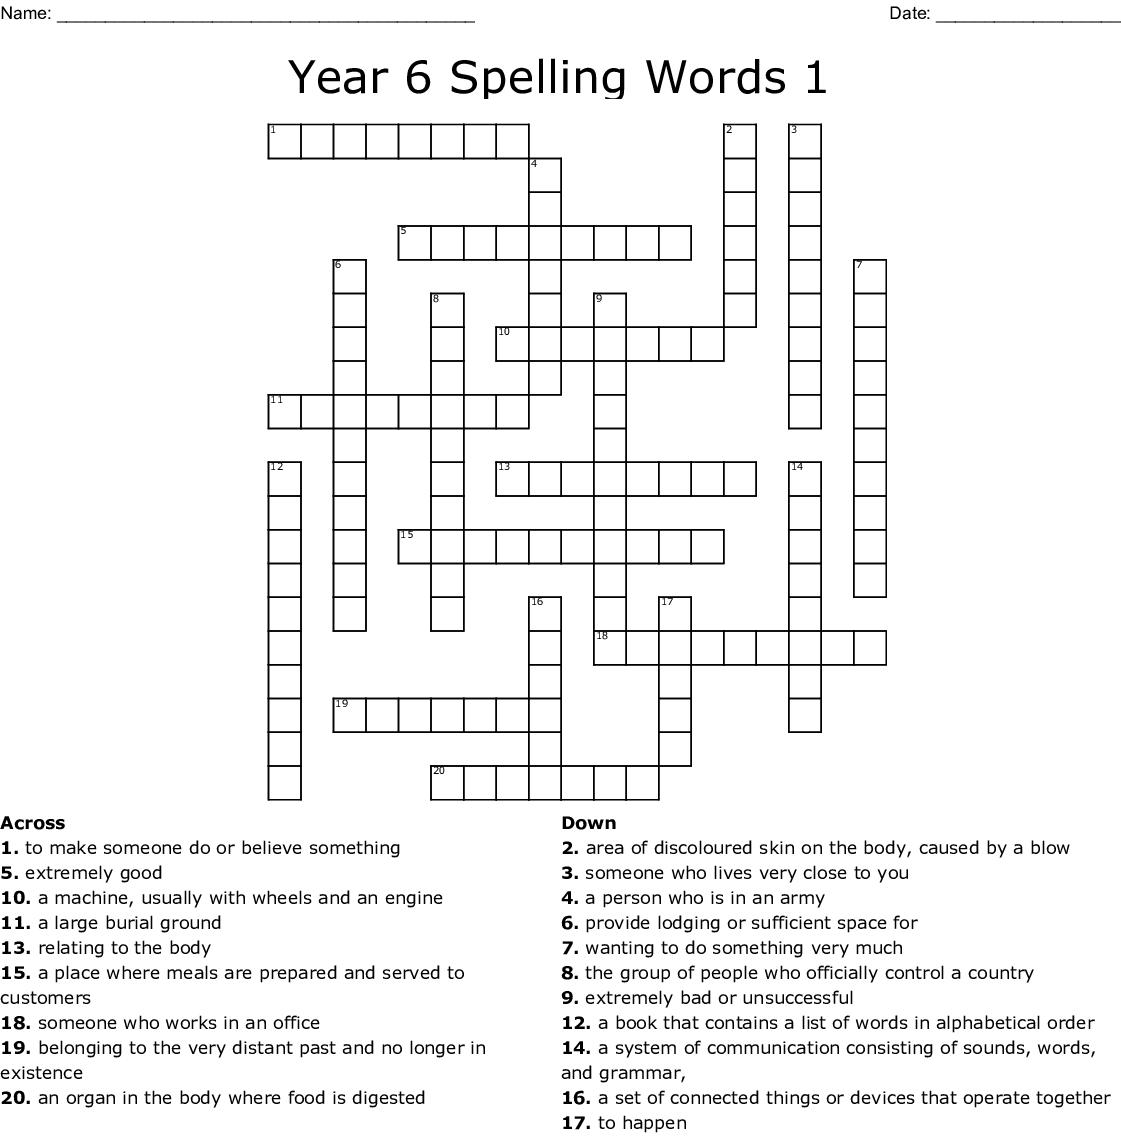 Year 6 Spelling Words 1 Crossword